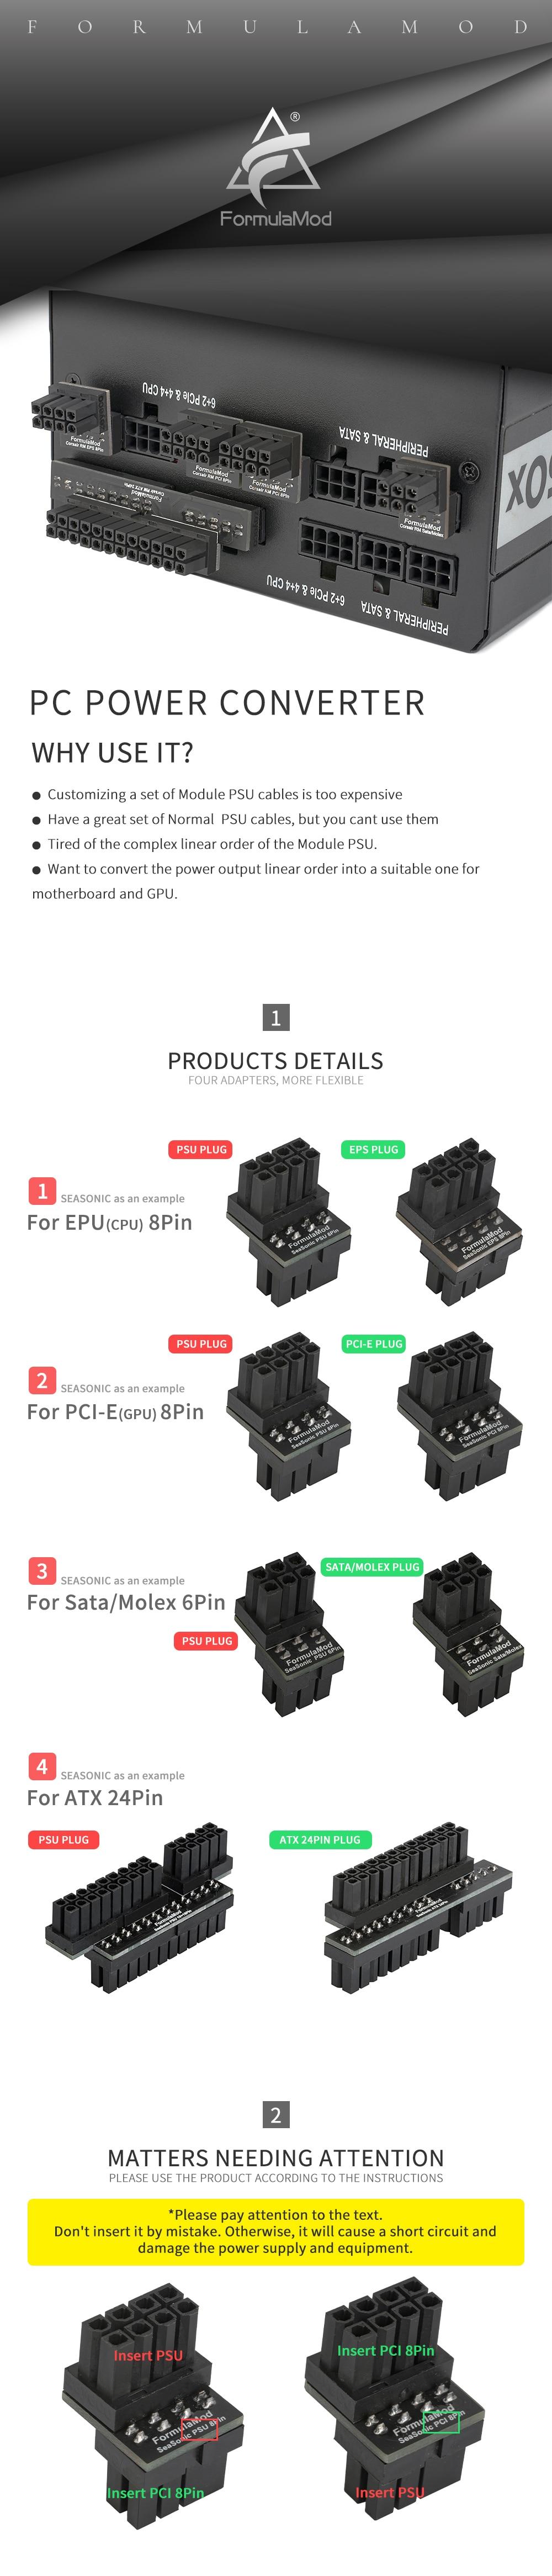 FormulaMod Modular PSU Changer Converter, Change the Modular Linear Order to Ordinary PSU Linear Order, For Corsair Seasonic